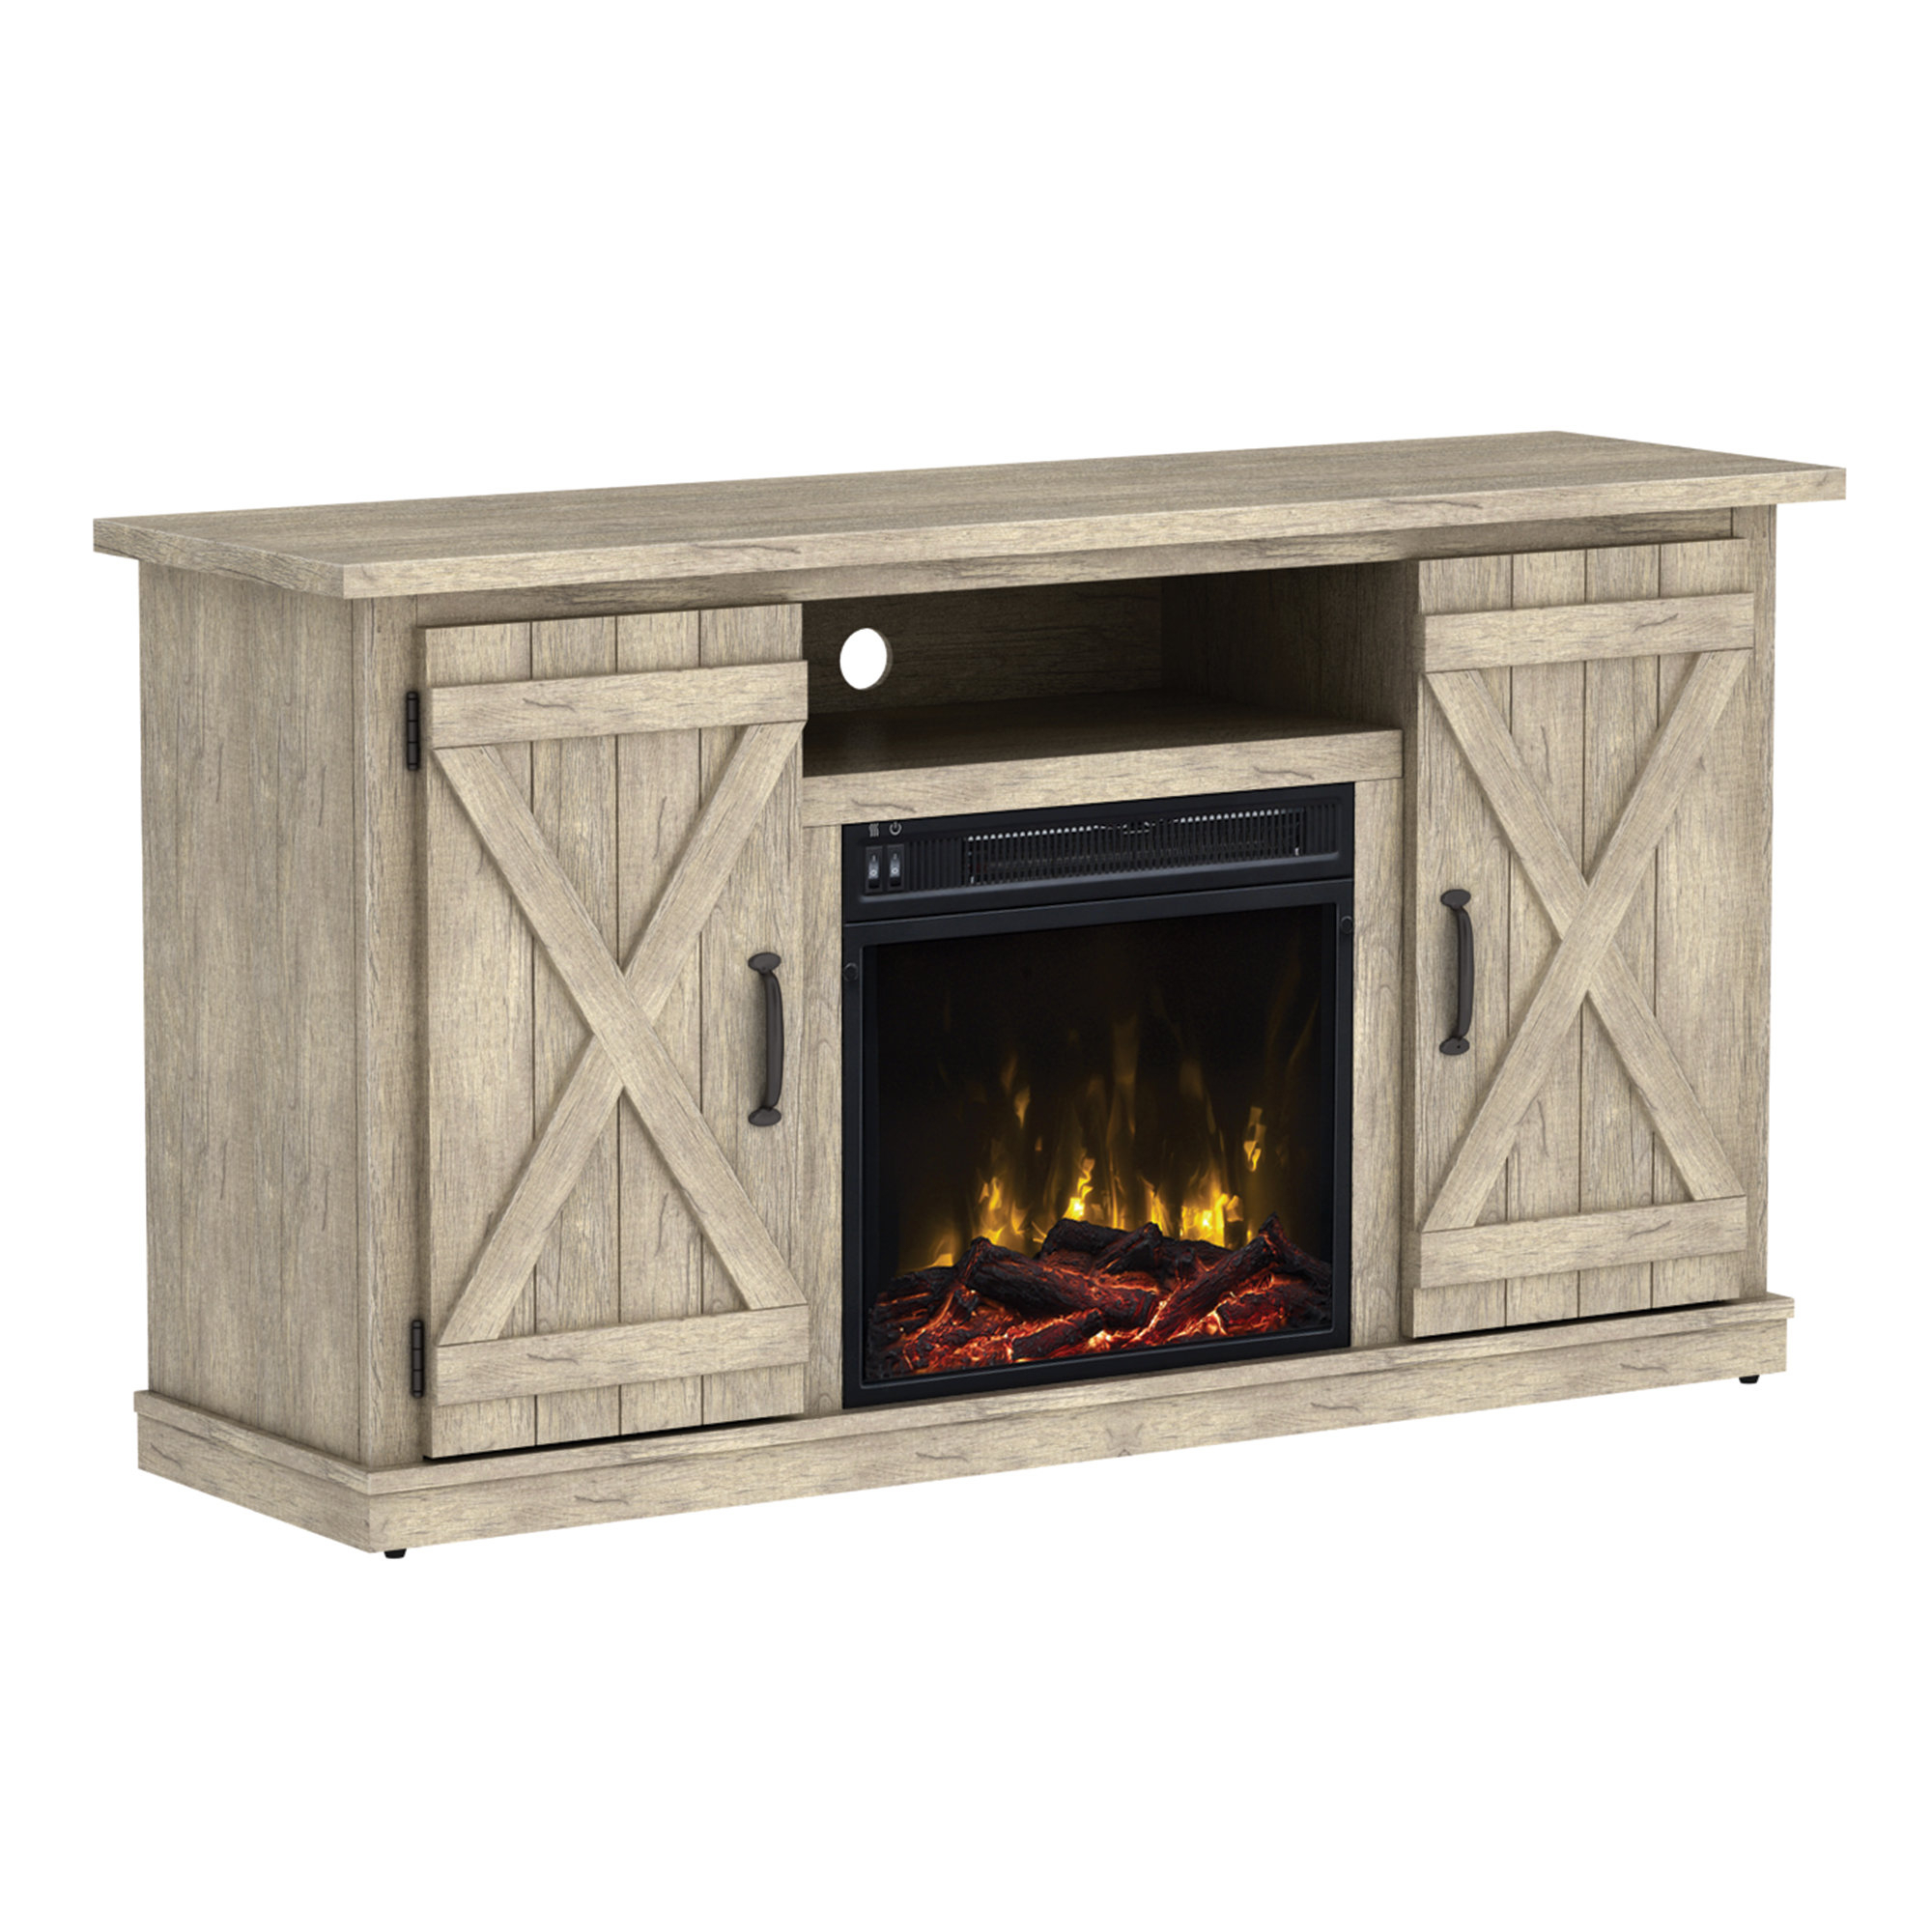 Joss & Main Inside Preferred Wood Tv Floor Stands (View 6 of 20)